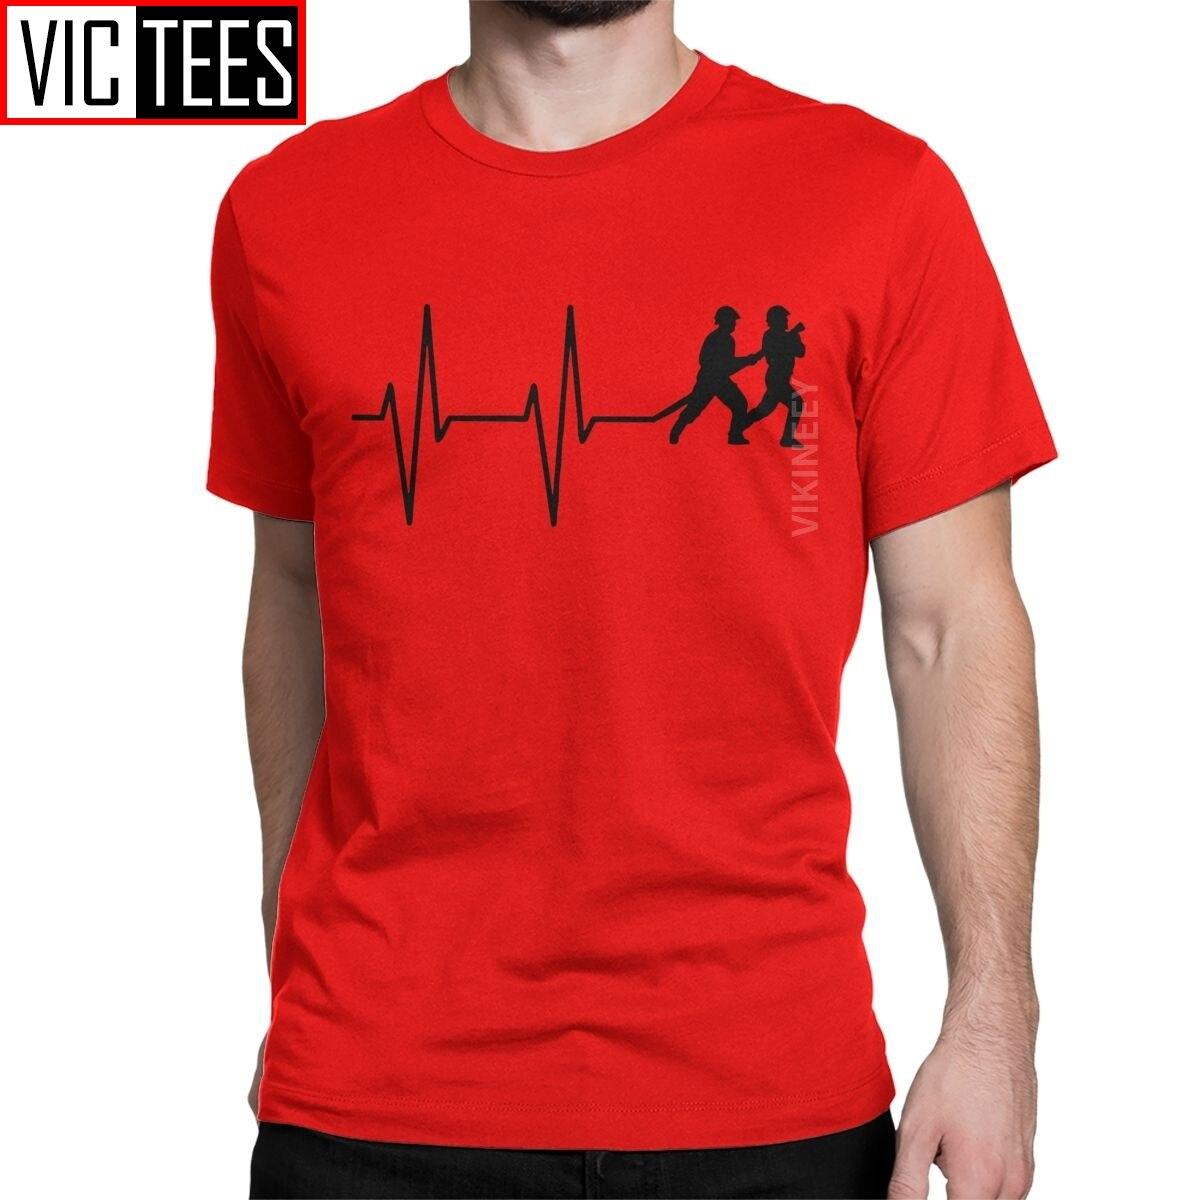 Men Fireman Heartbeat Firefighter Tshirt Fire Hose Worker Uniform Rescue Cotton Clothes Classic T-Shirt